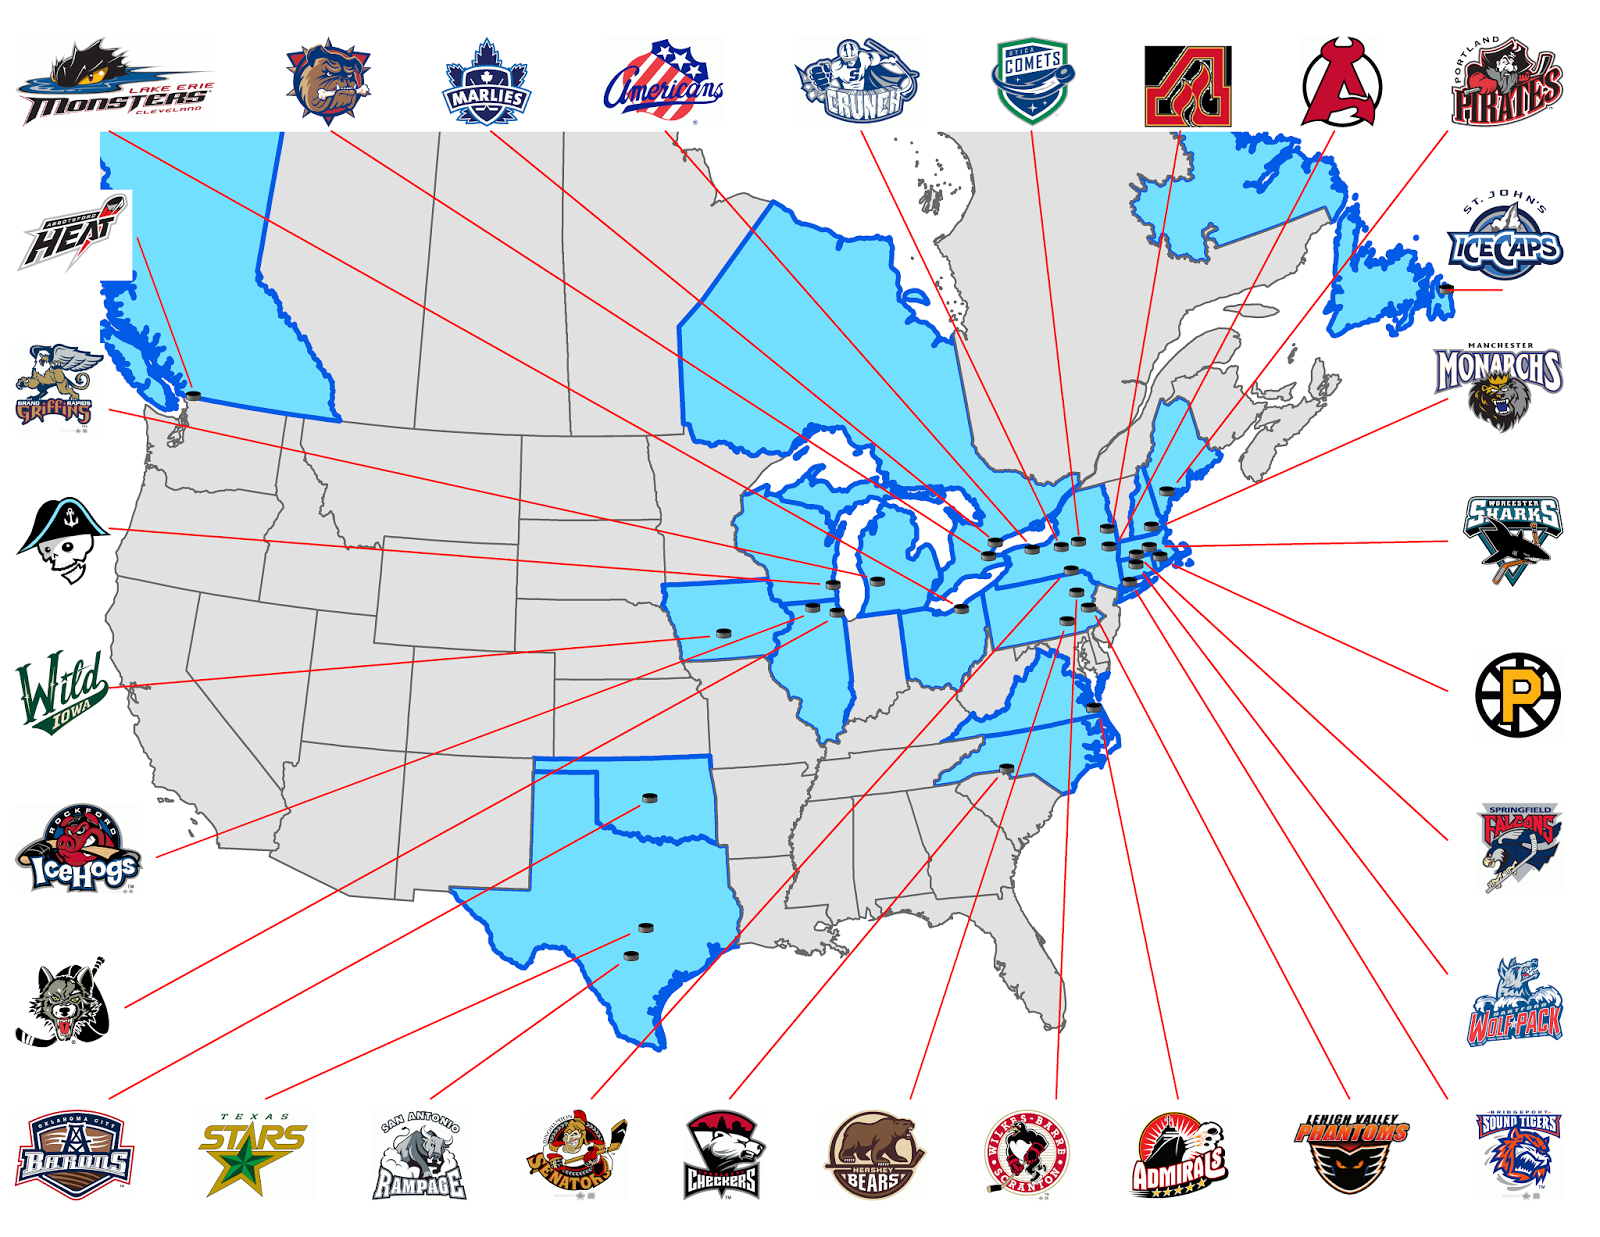 Next Major League Expansion Team: Minor League Hockey: AHL and